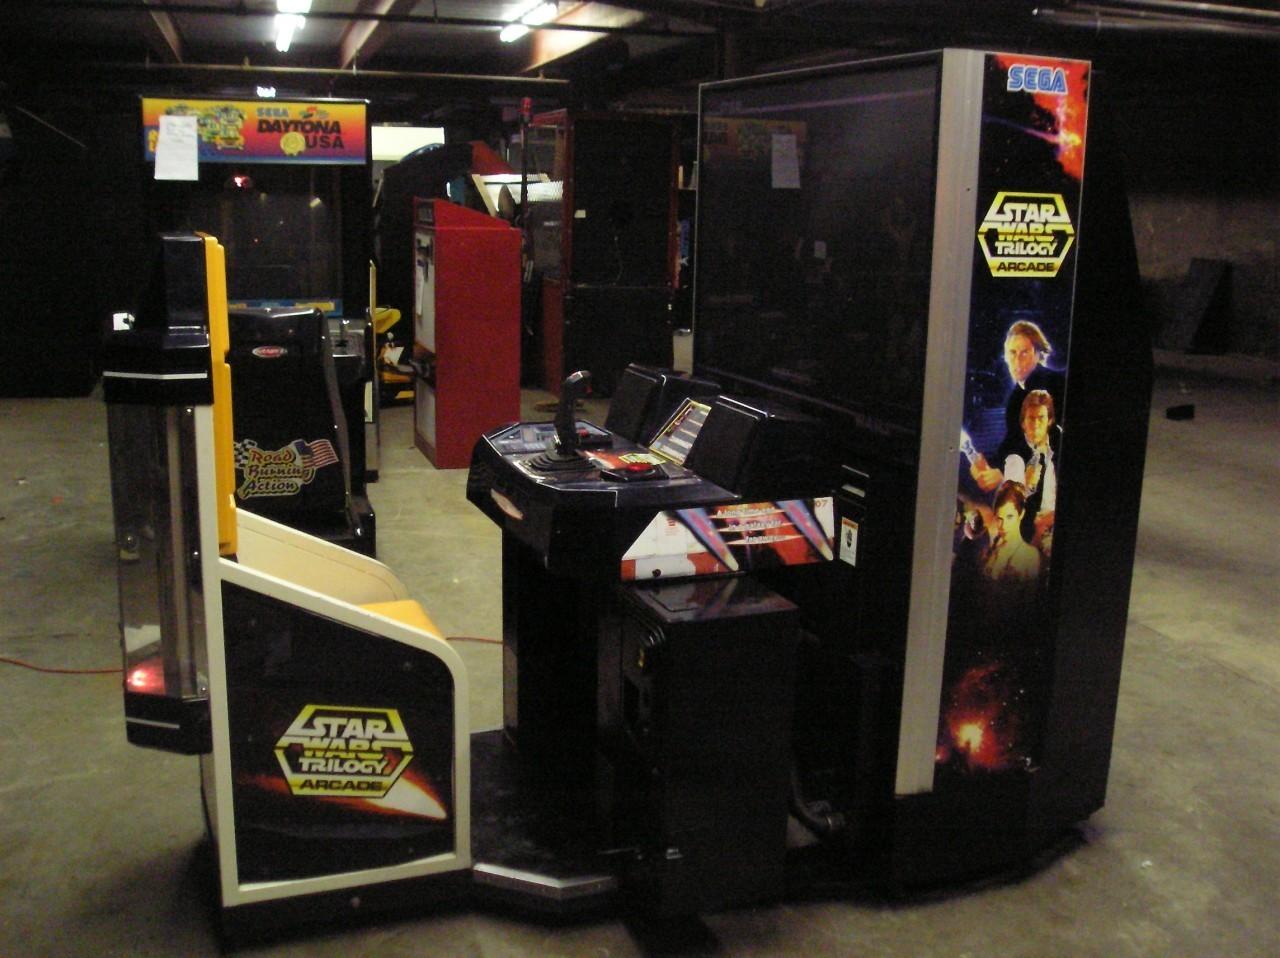 Star Wars Cabinet Video Arcade Other